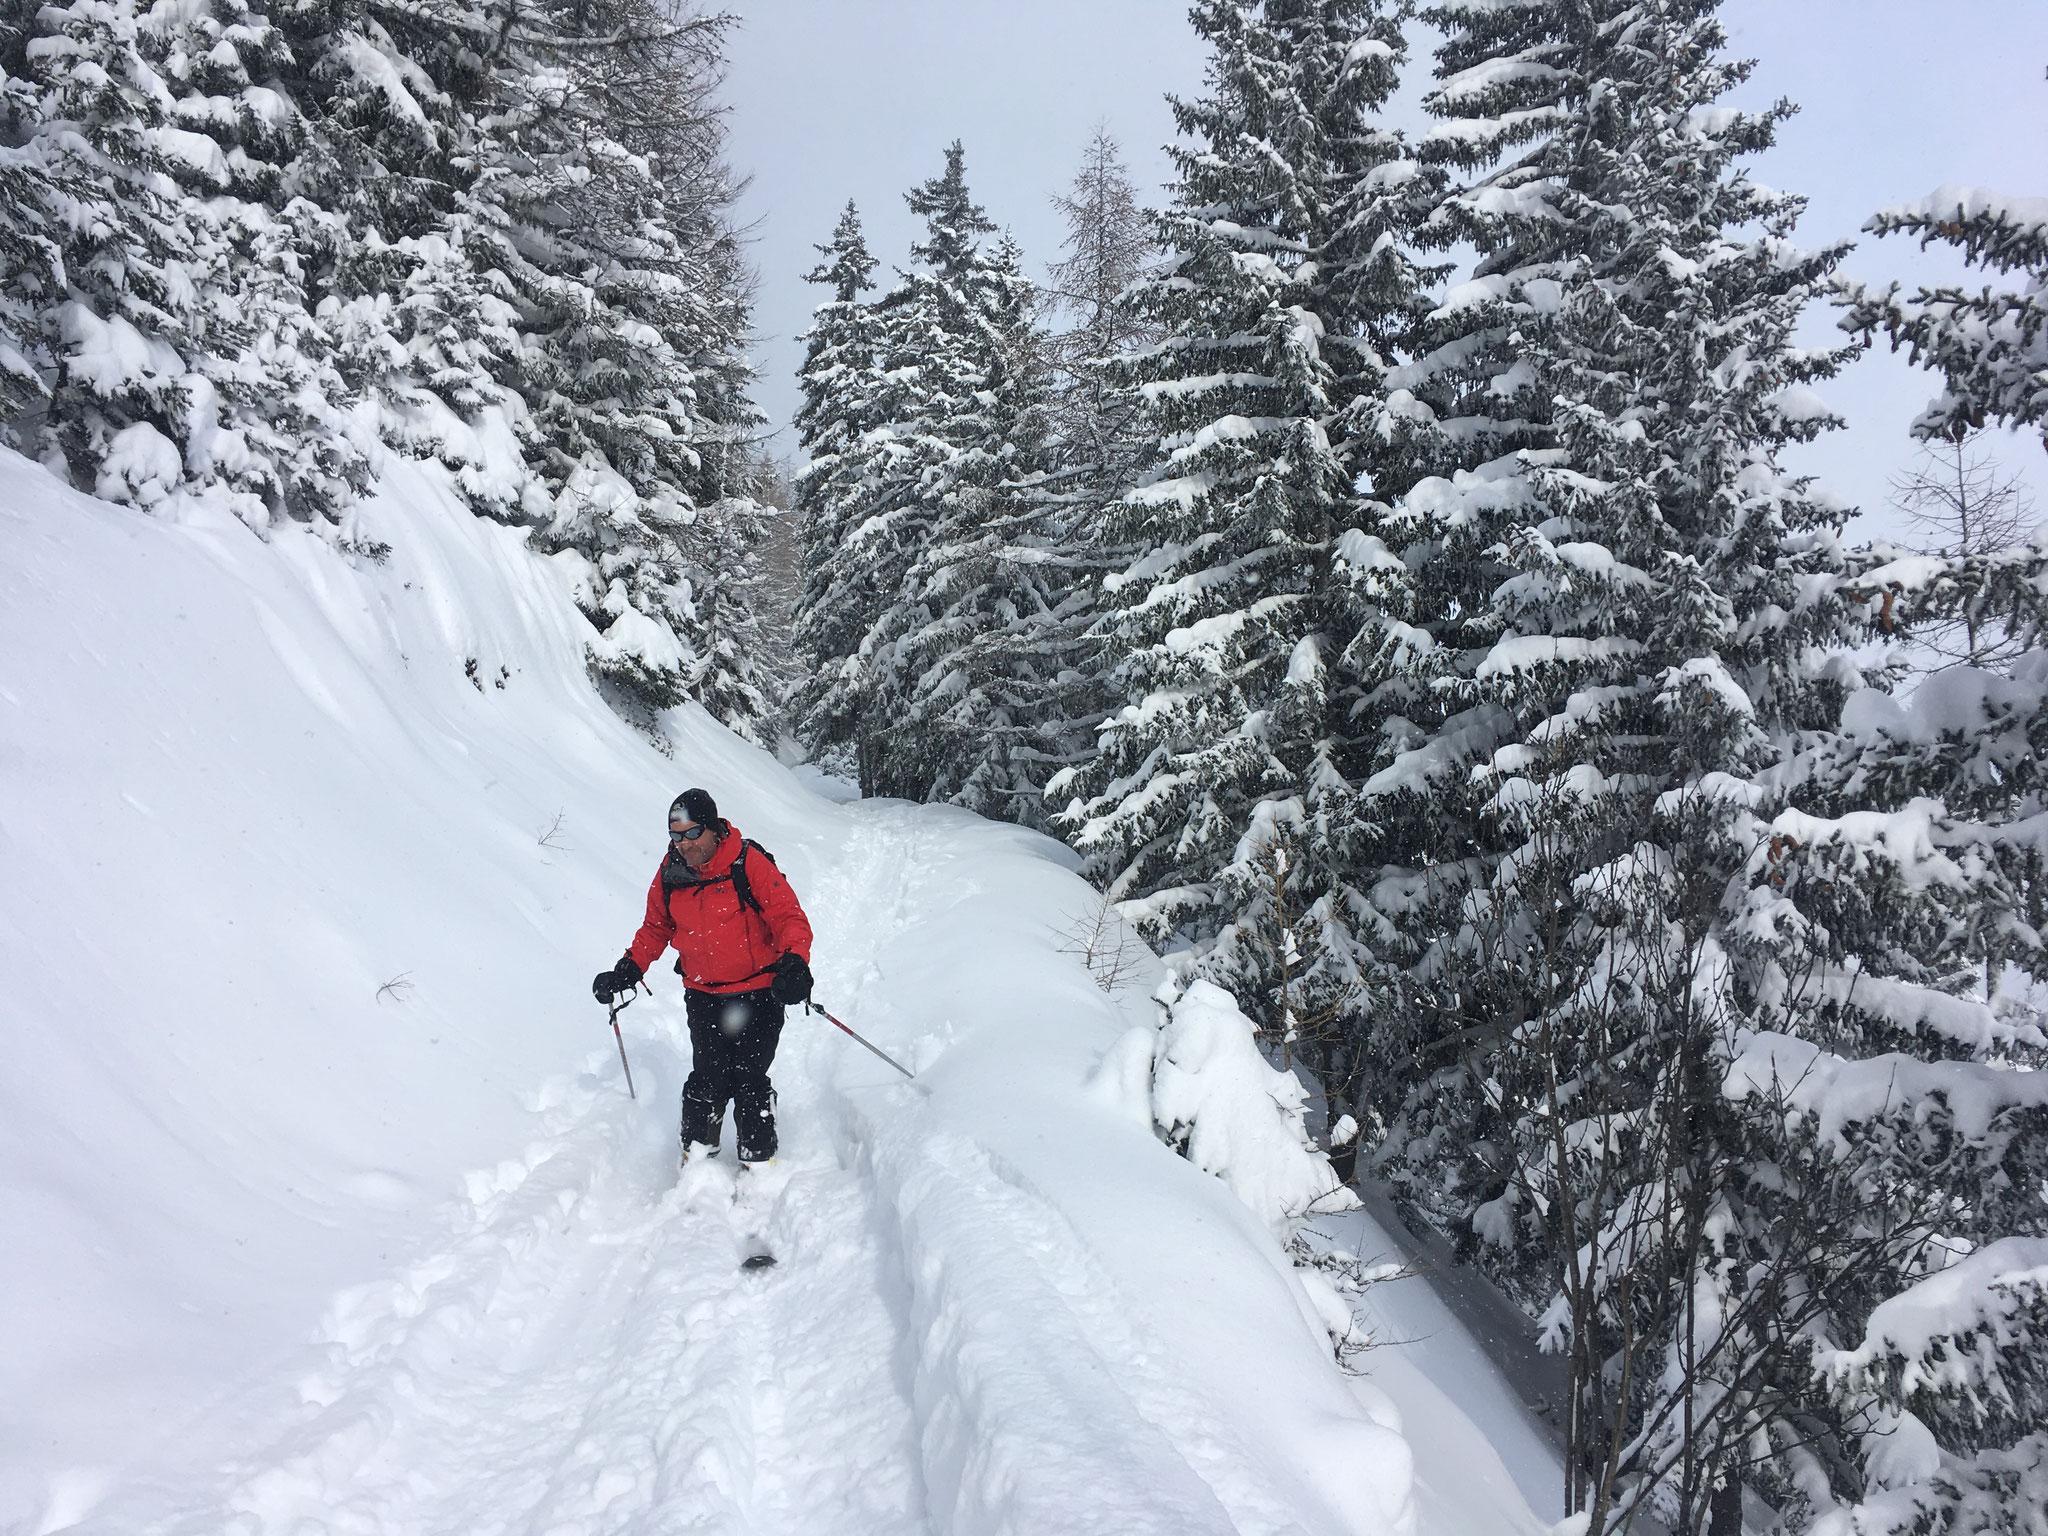 Descente ambiance hivernale en forêt